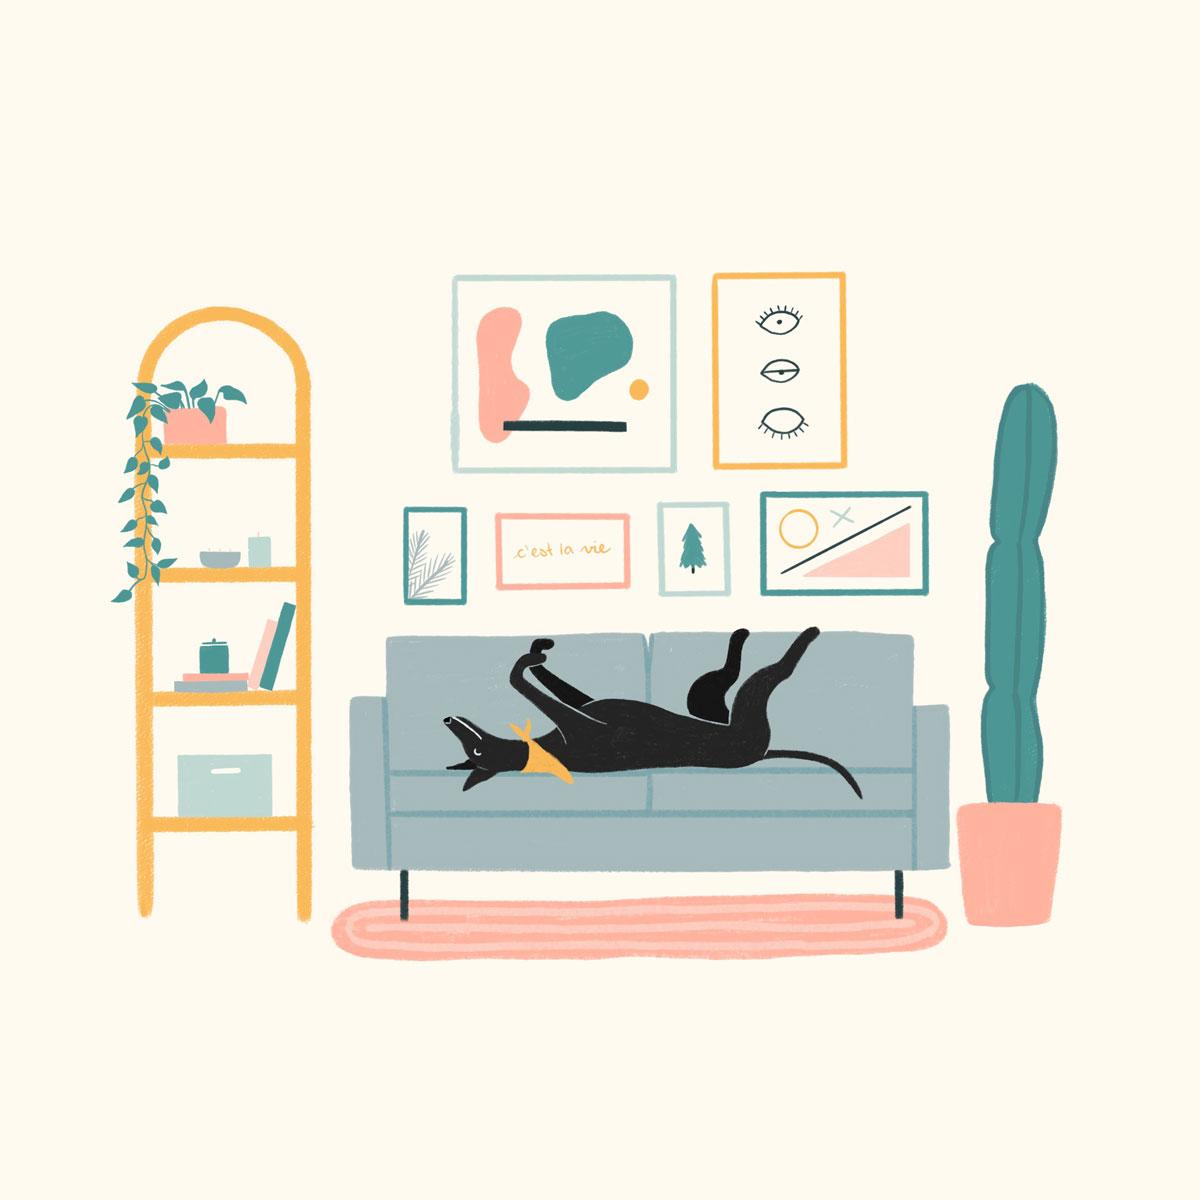 dog on couch illustration Kaila Elders